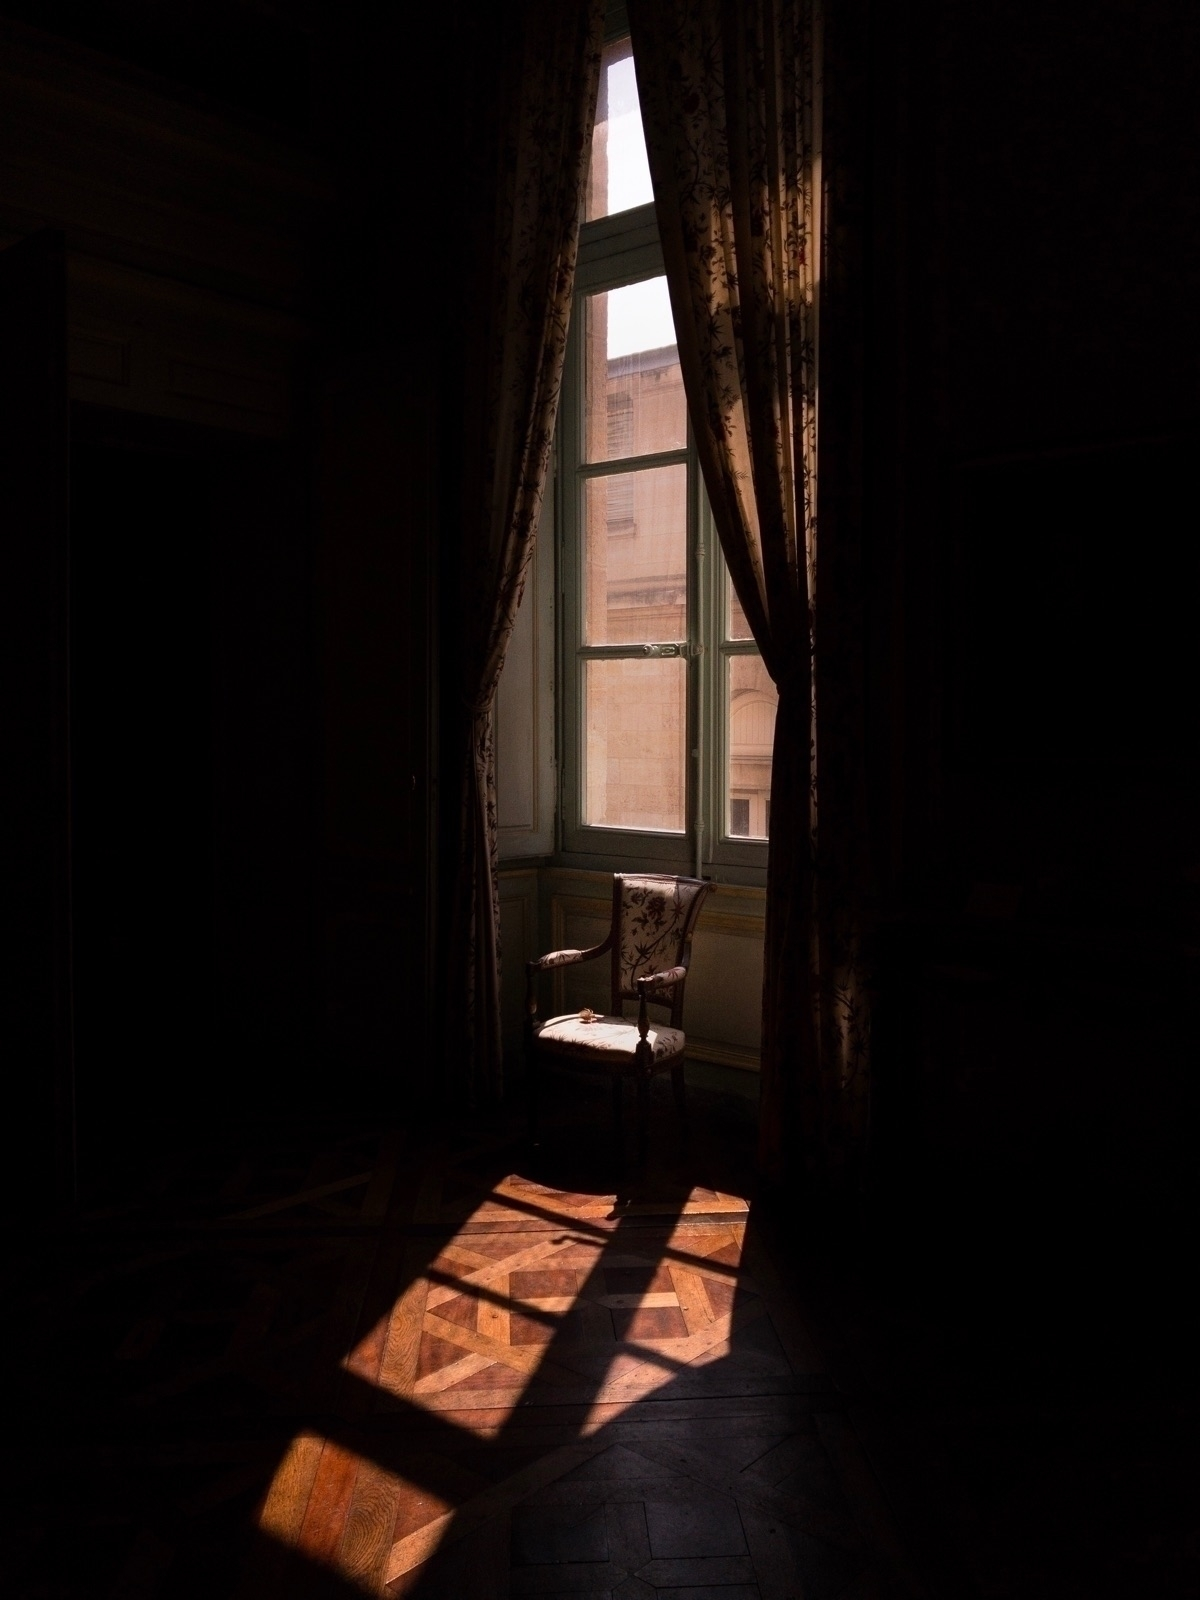 negativespace, contrast, sunlight - oliviermorisse | ello